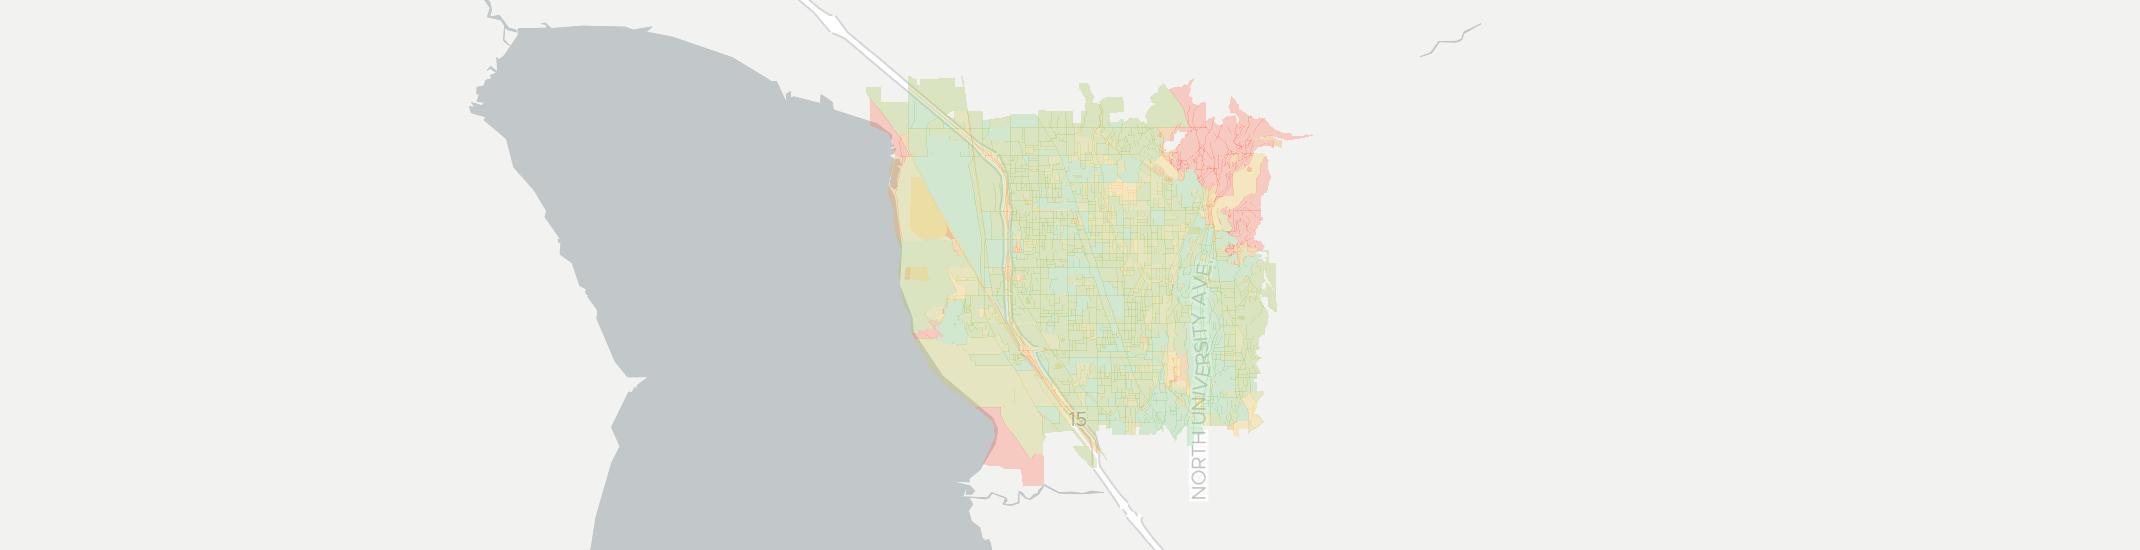 Orem Utah Zip Code Map.Orem Has 23 Internet Service Providers Broadbandnow Com